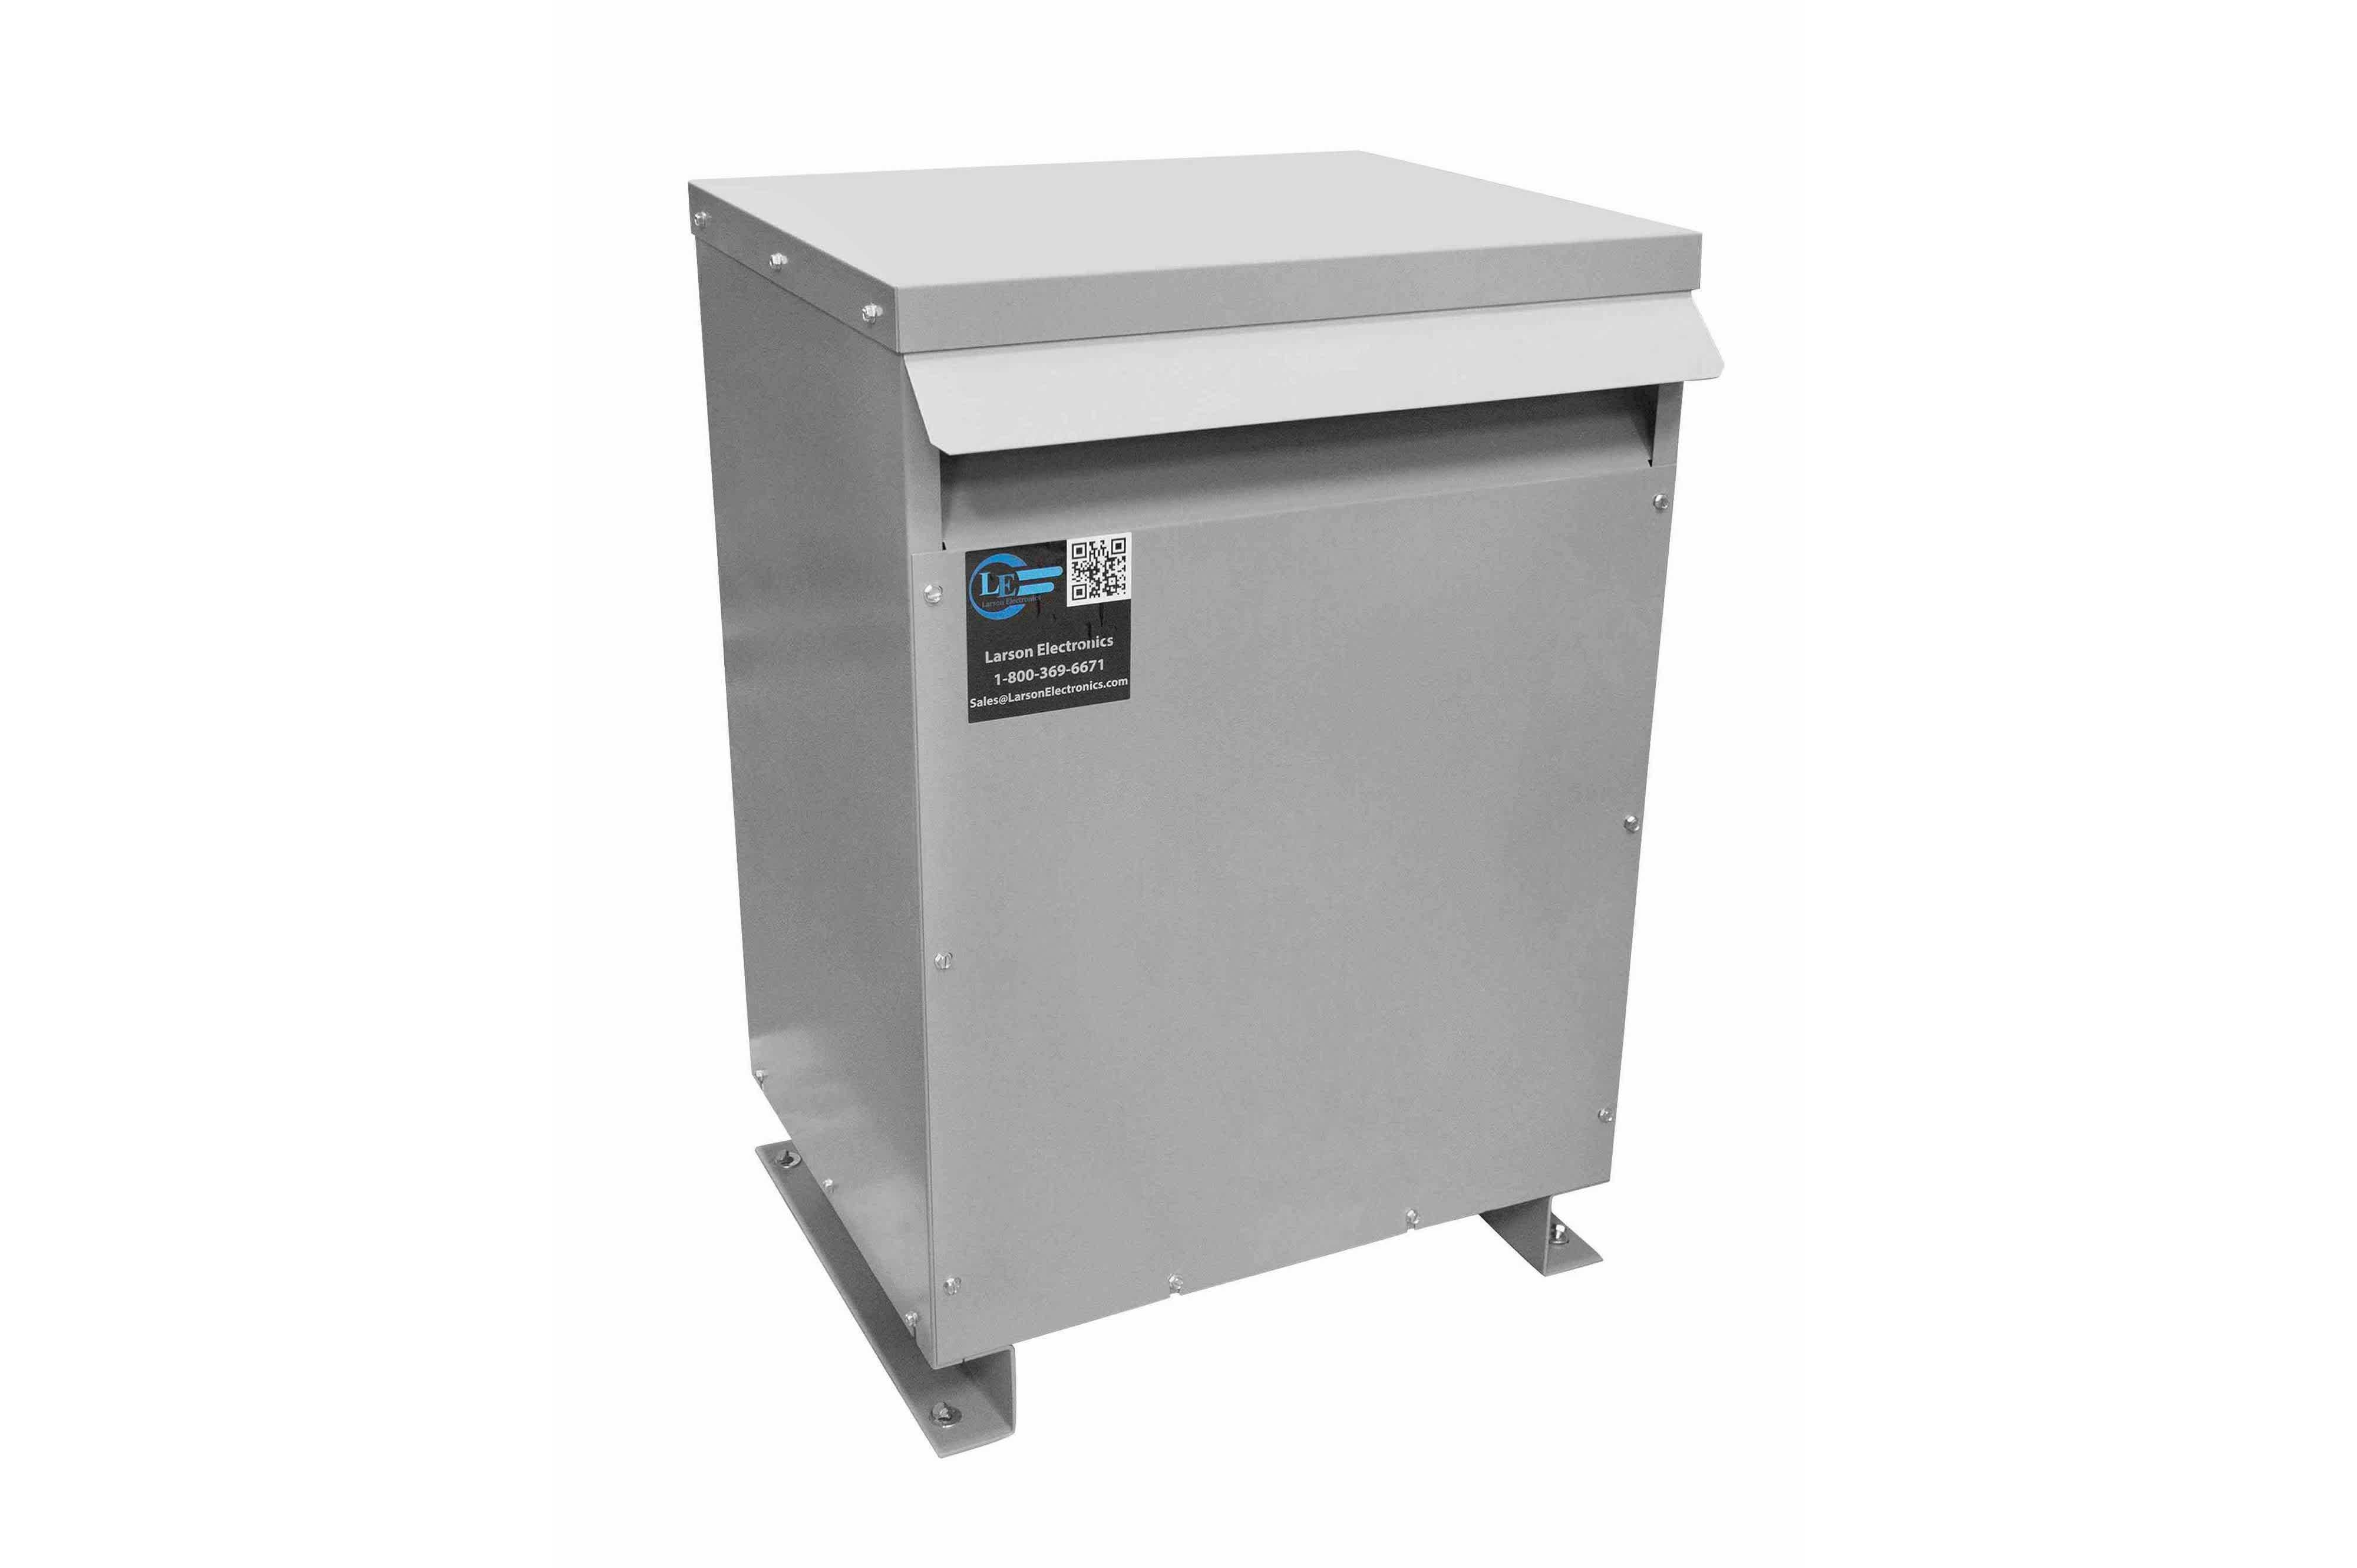 250 kVA 3PH Isolation Transformer, 440V Wye Primary, 240V Delta Secondary, N3R, Ventilated, 60 Hz